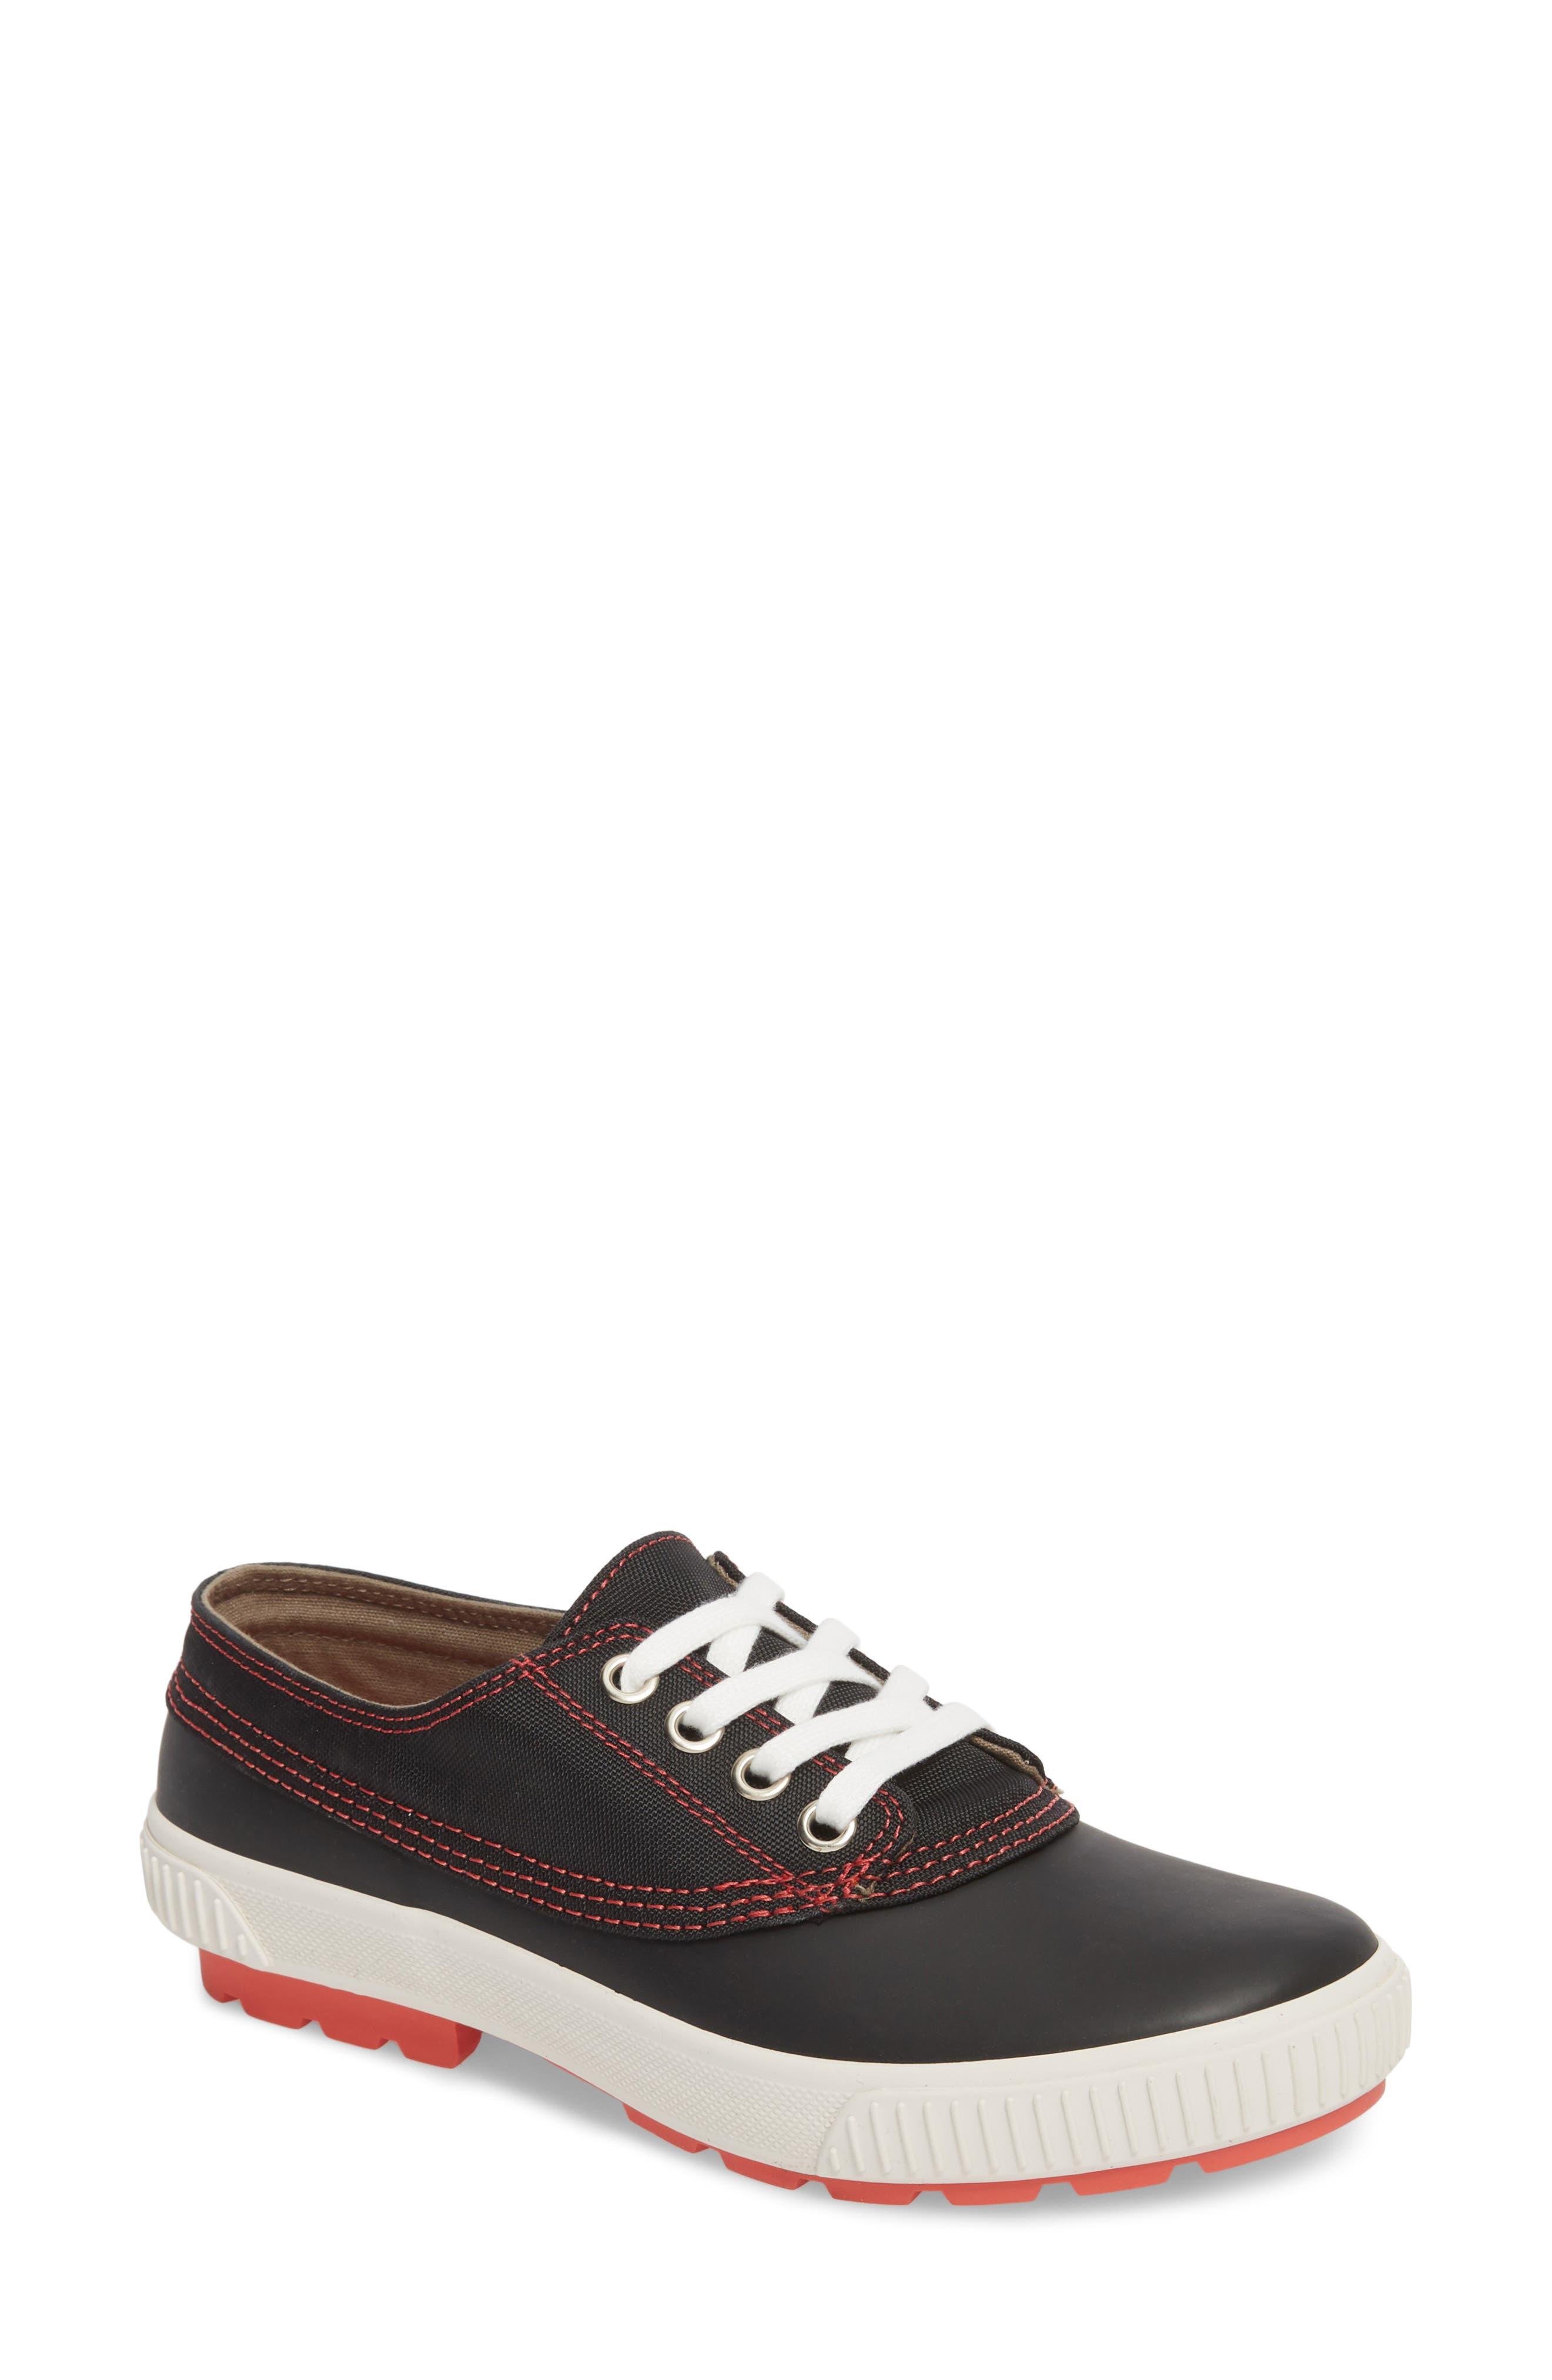 Dash Duck Sneaker,                         Main,                         color, Black/ Coral